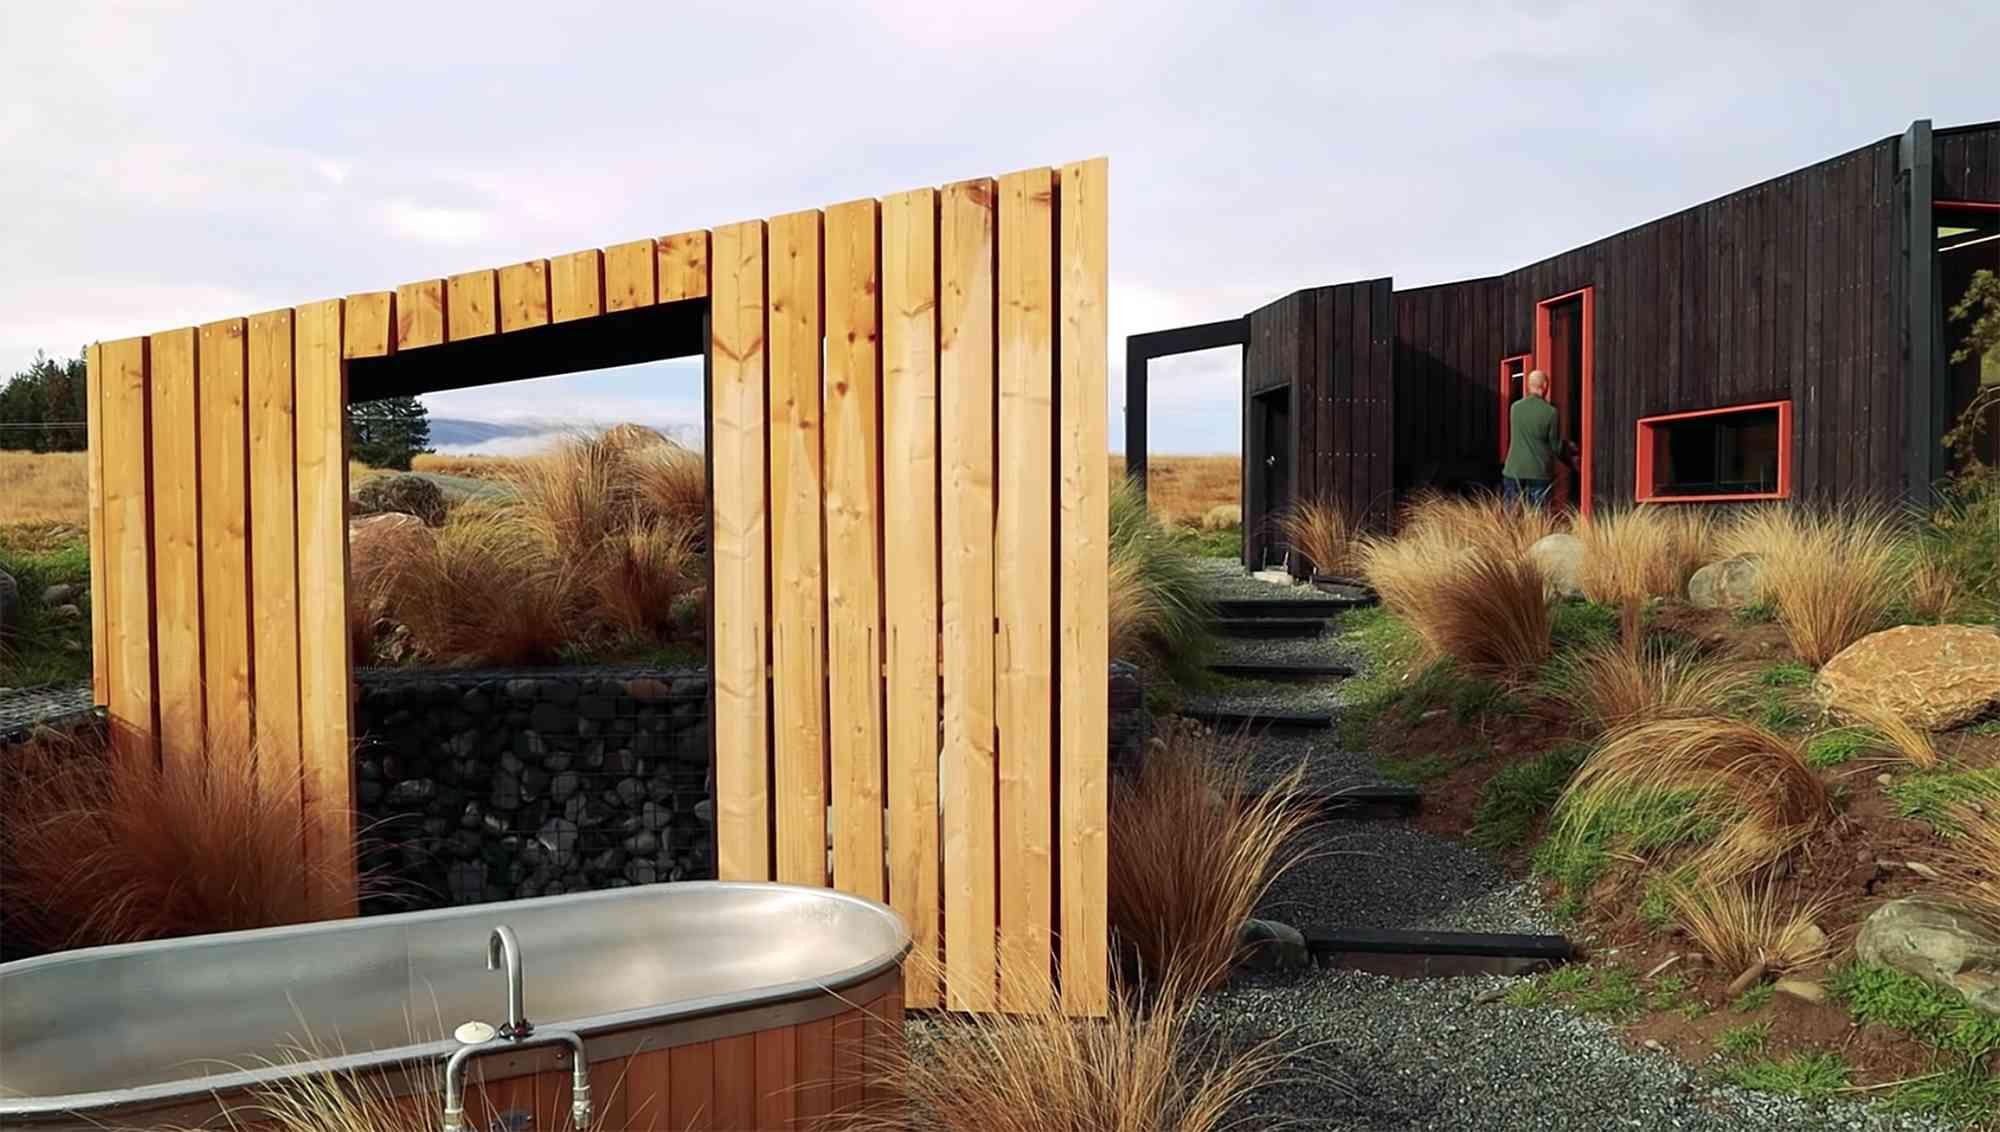 Skylark Cabin by Barry Connor open air bathtub